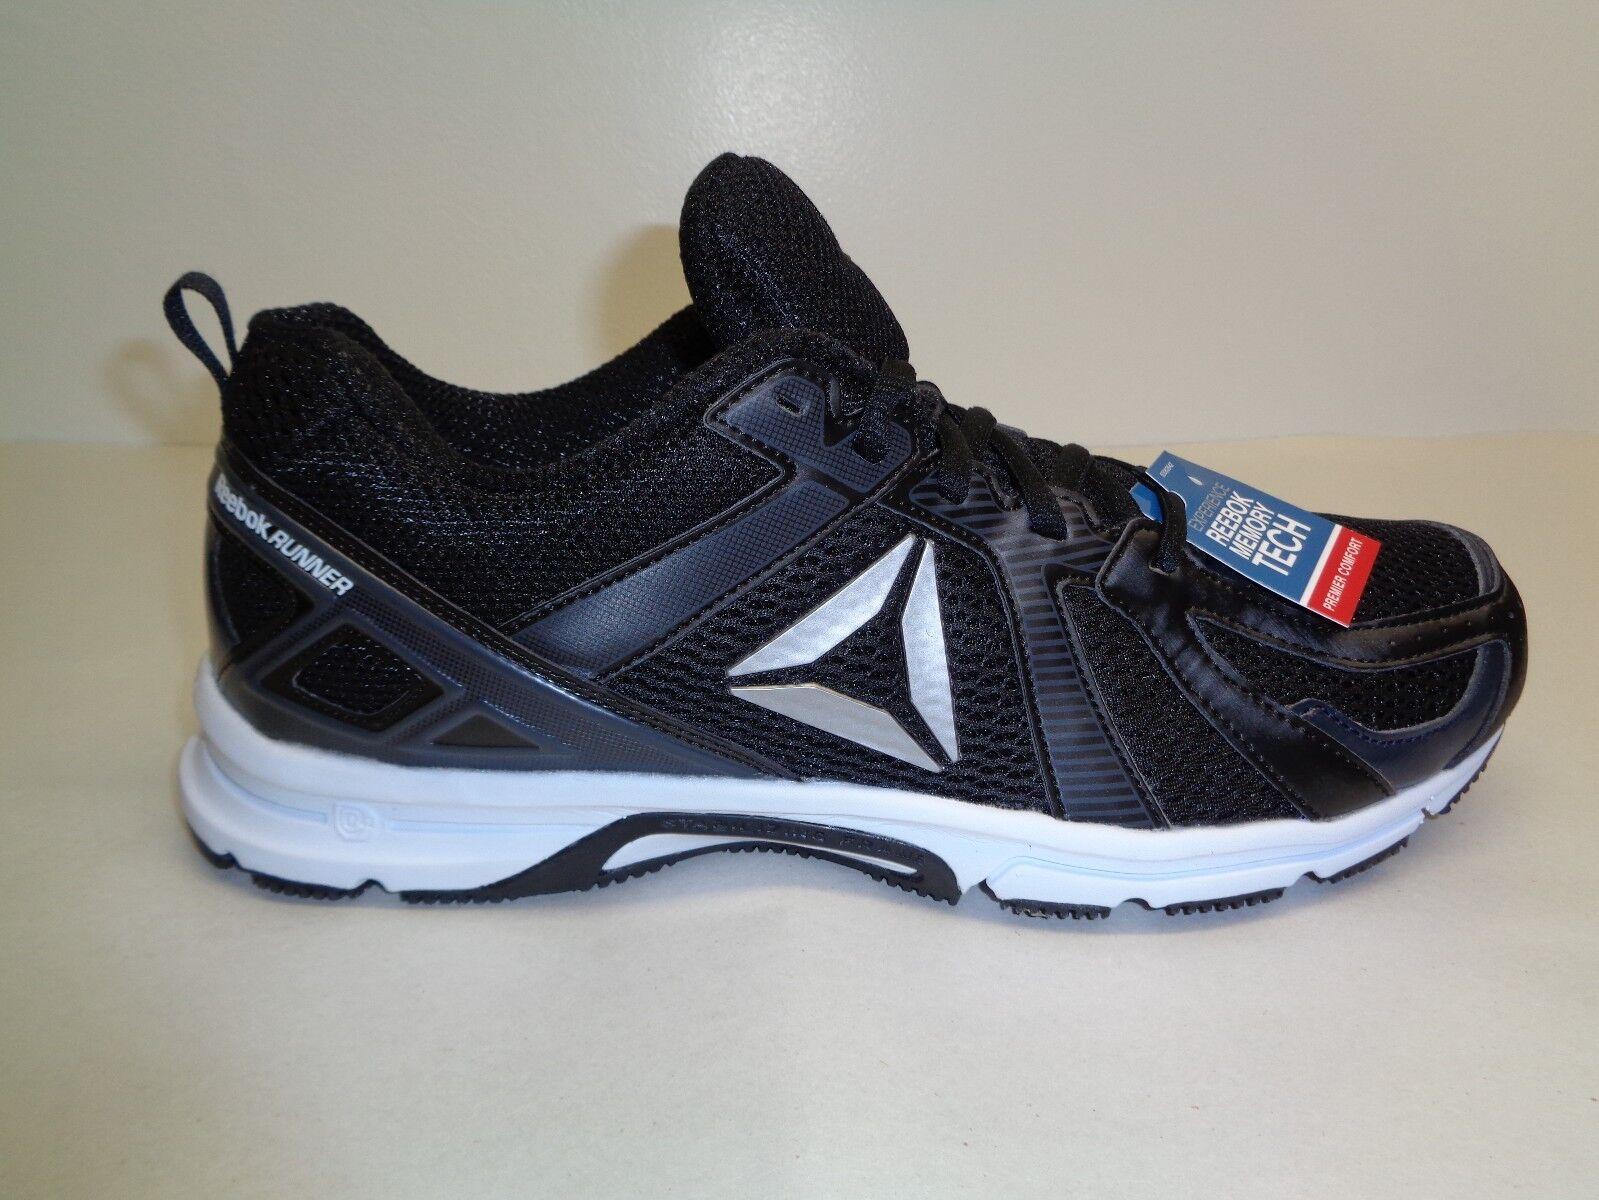 Reebok Size 11 M RUNNER MT Black Coal White Running Sneakers New Mens Shoes